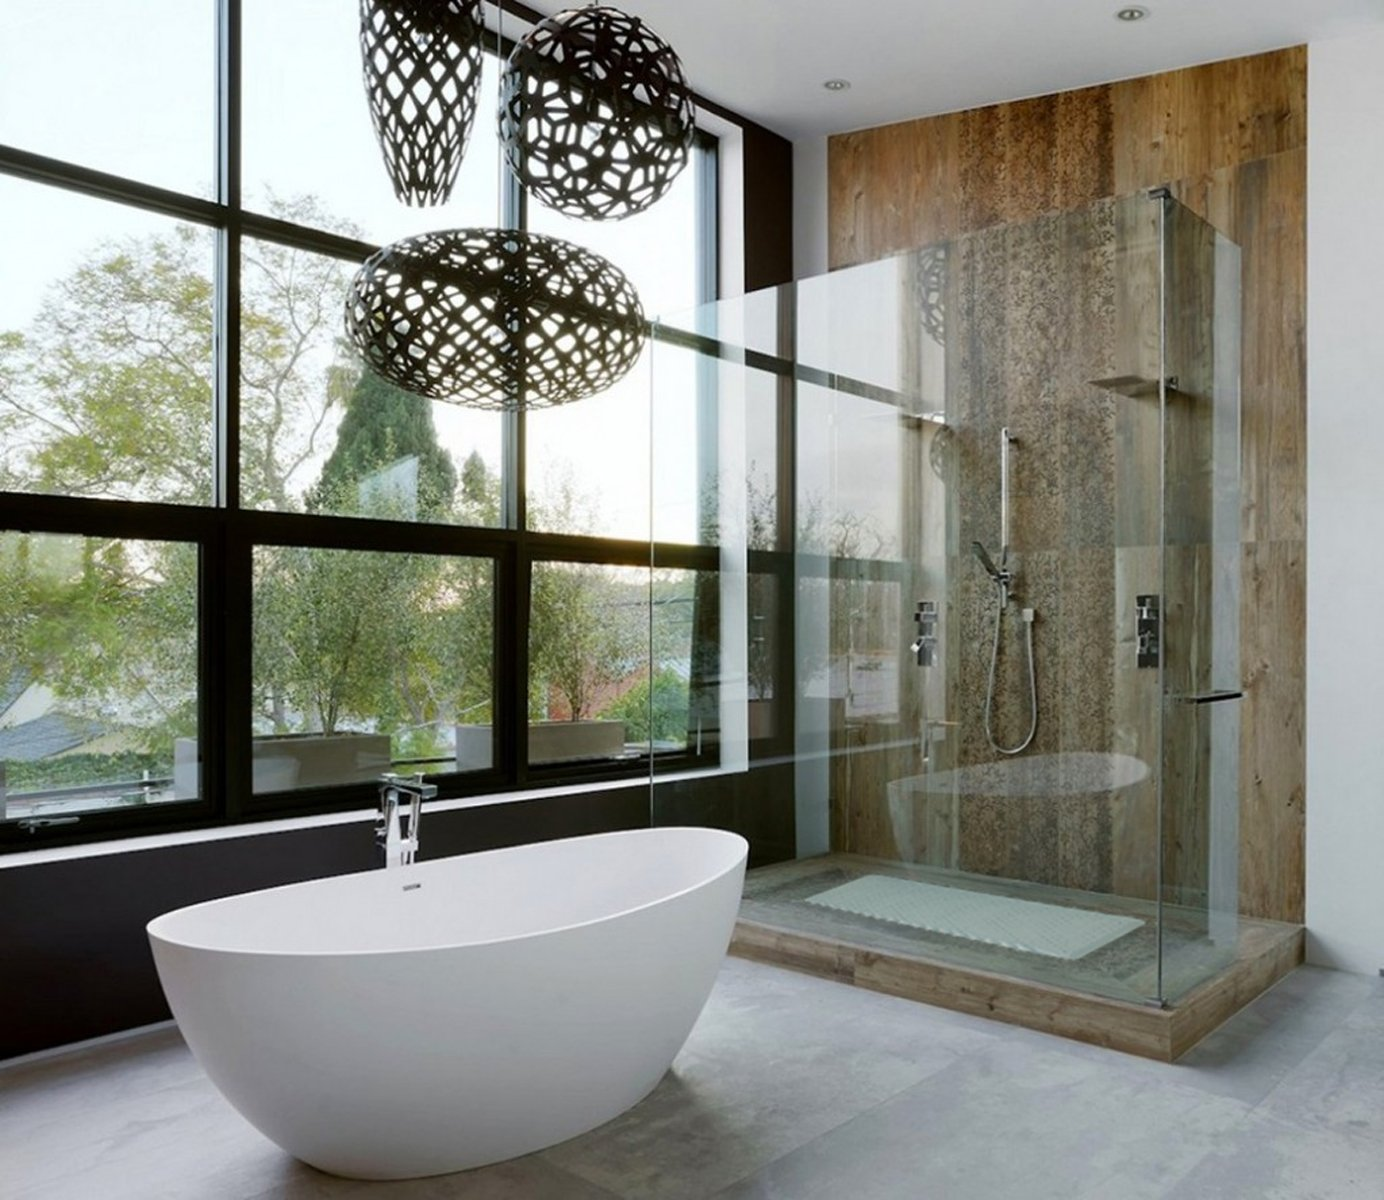 amazon com silicone bath mat 15 25 x 26 75 clear home kitchen